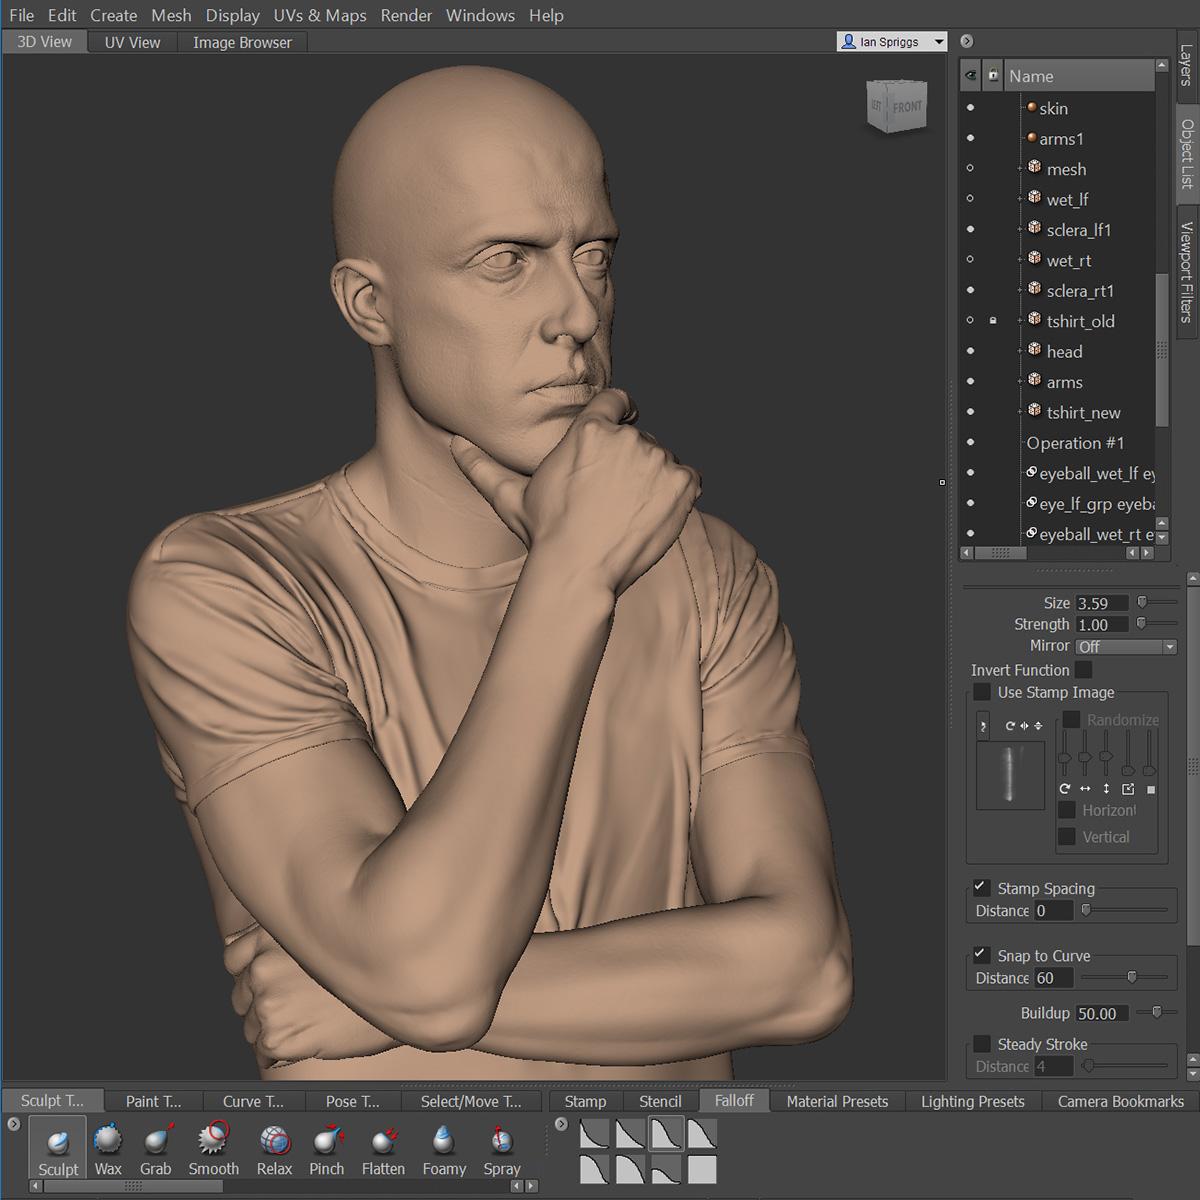 Andre Luis Mudbox sculpt